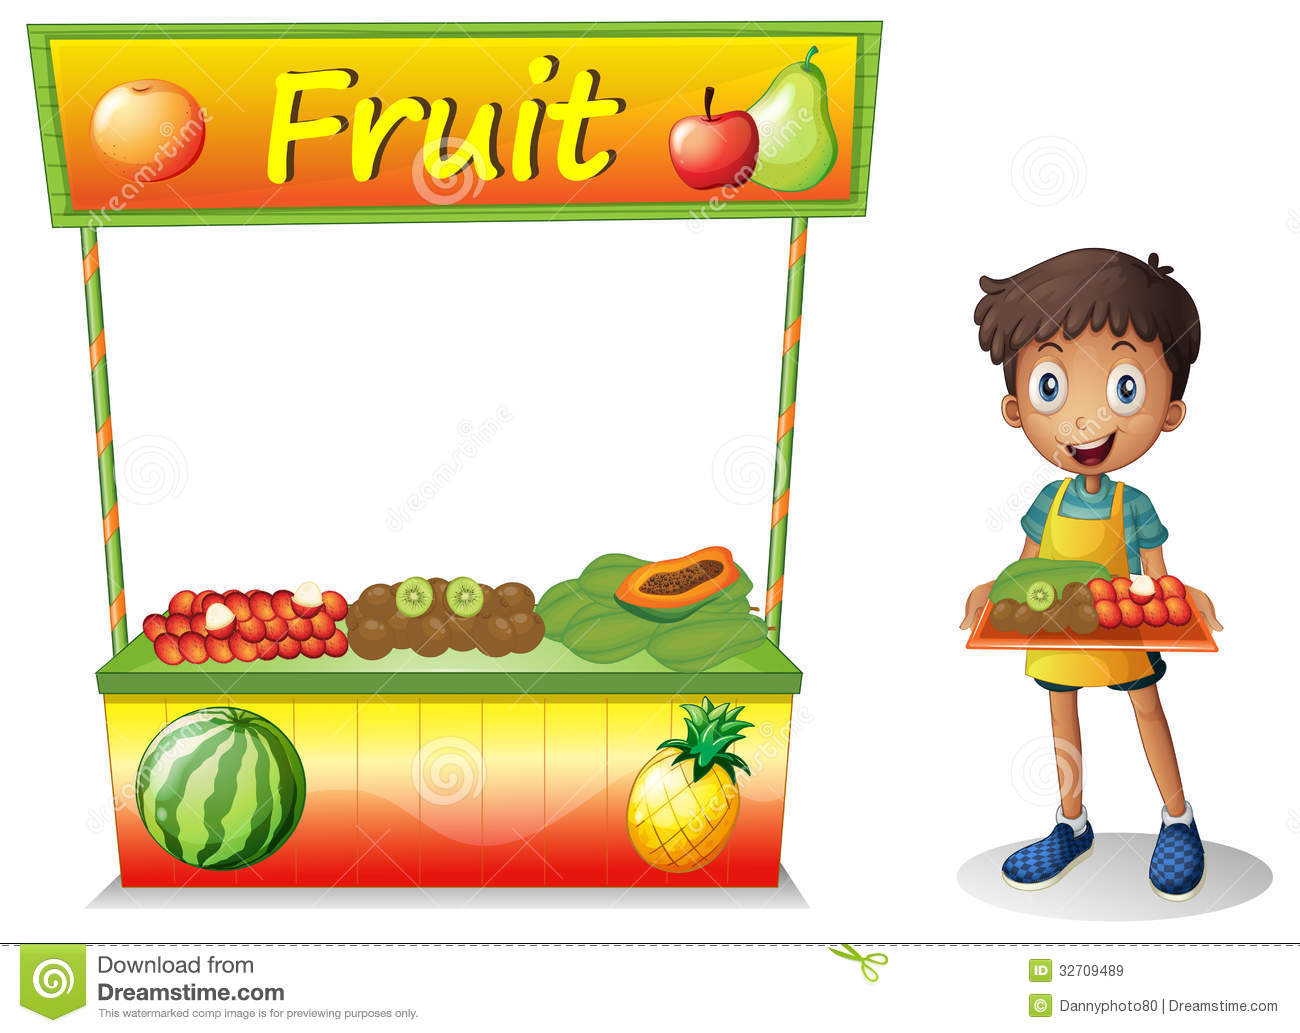 Fruit stall clipart.